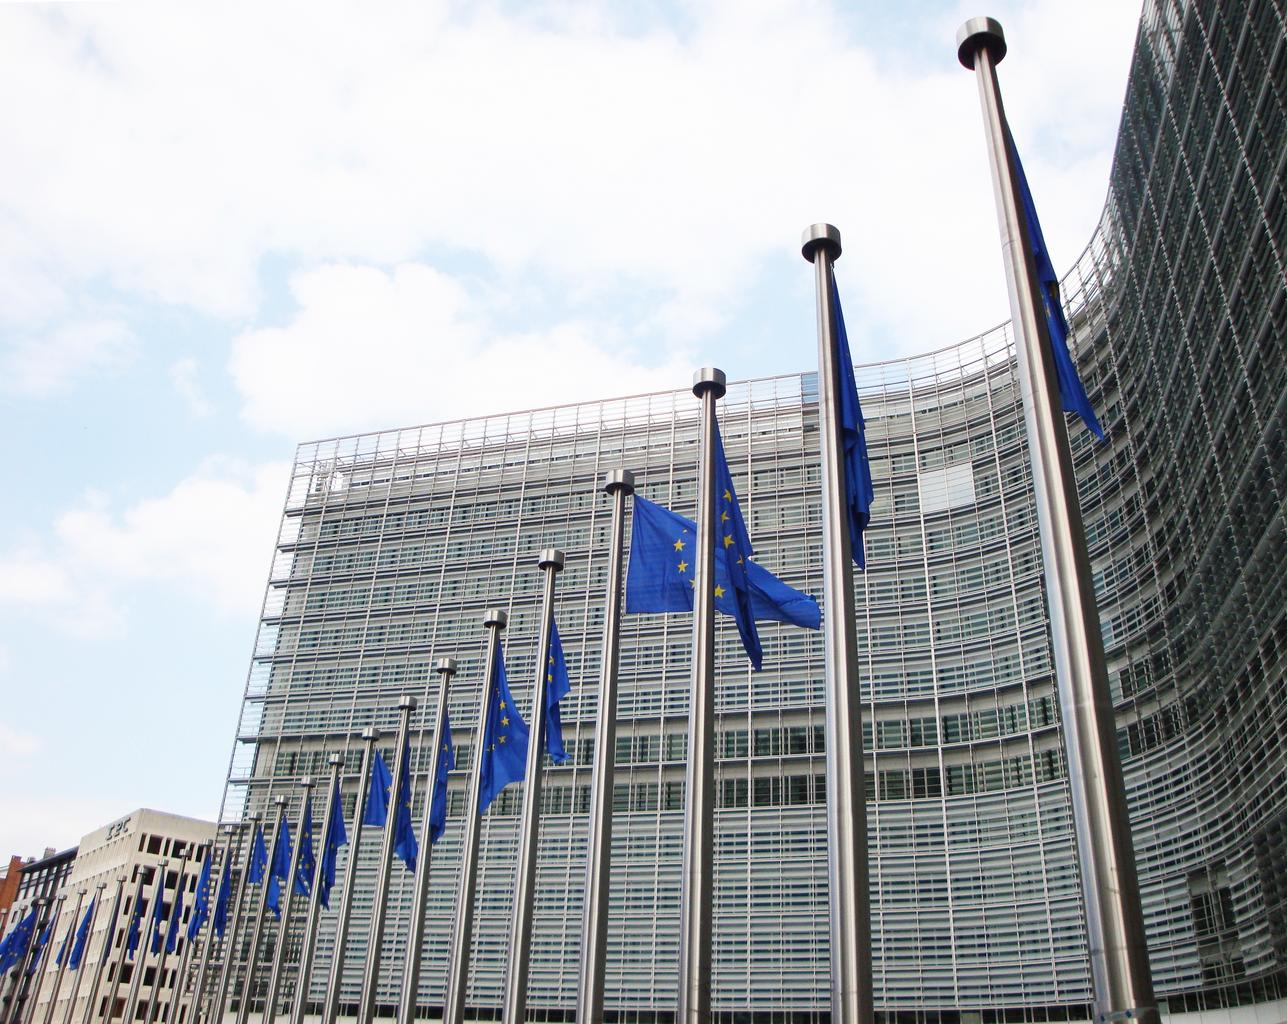 EU funding – Response to resolution